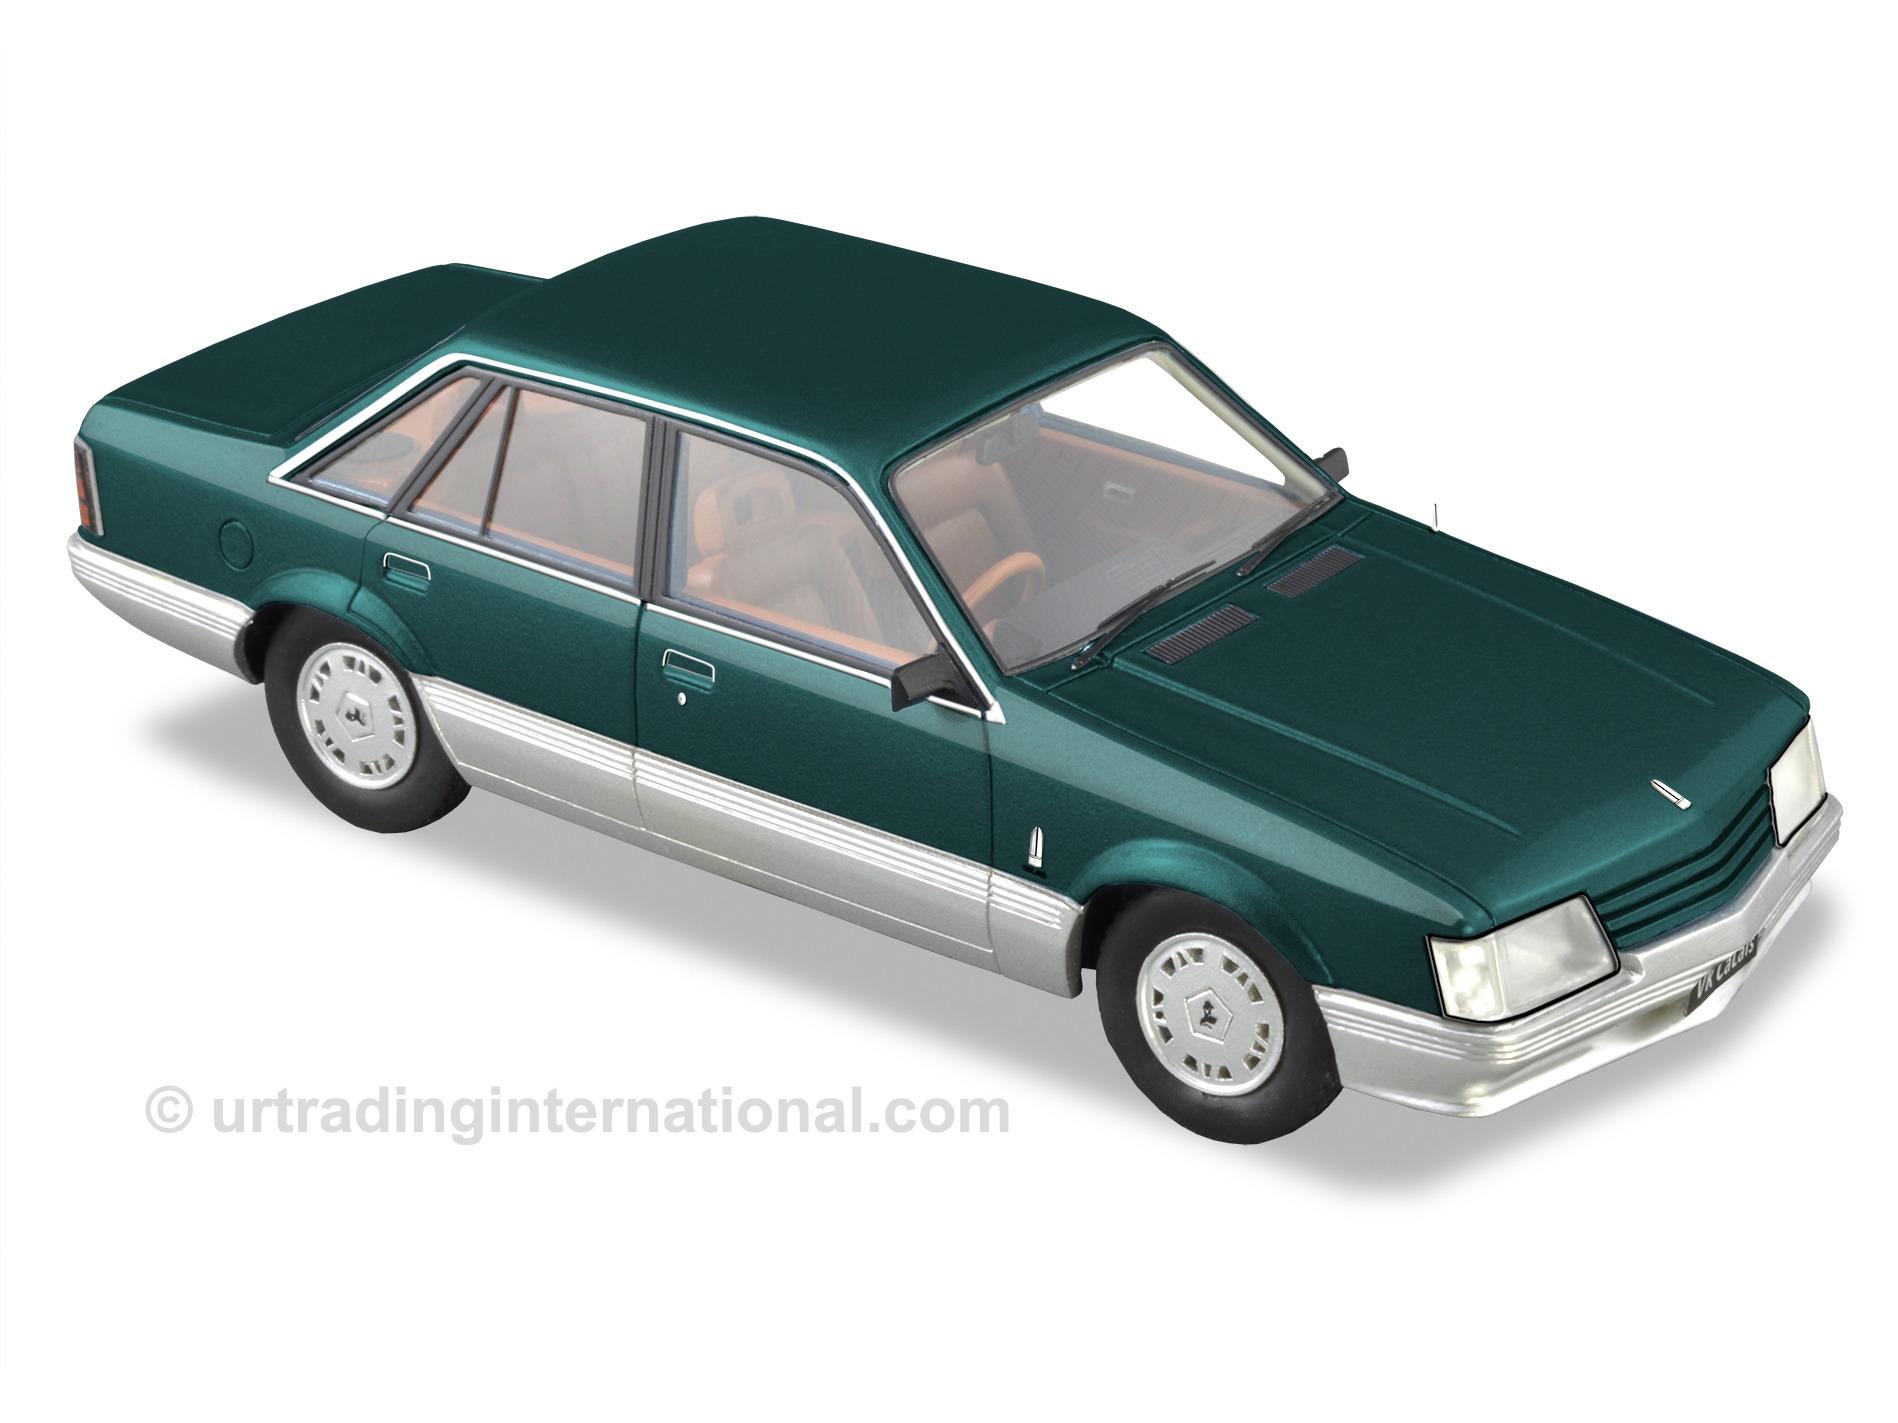 1984-86 VK Calais 5.0 Ltr V8 –  Cerulean